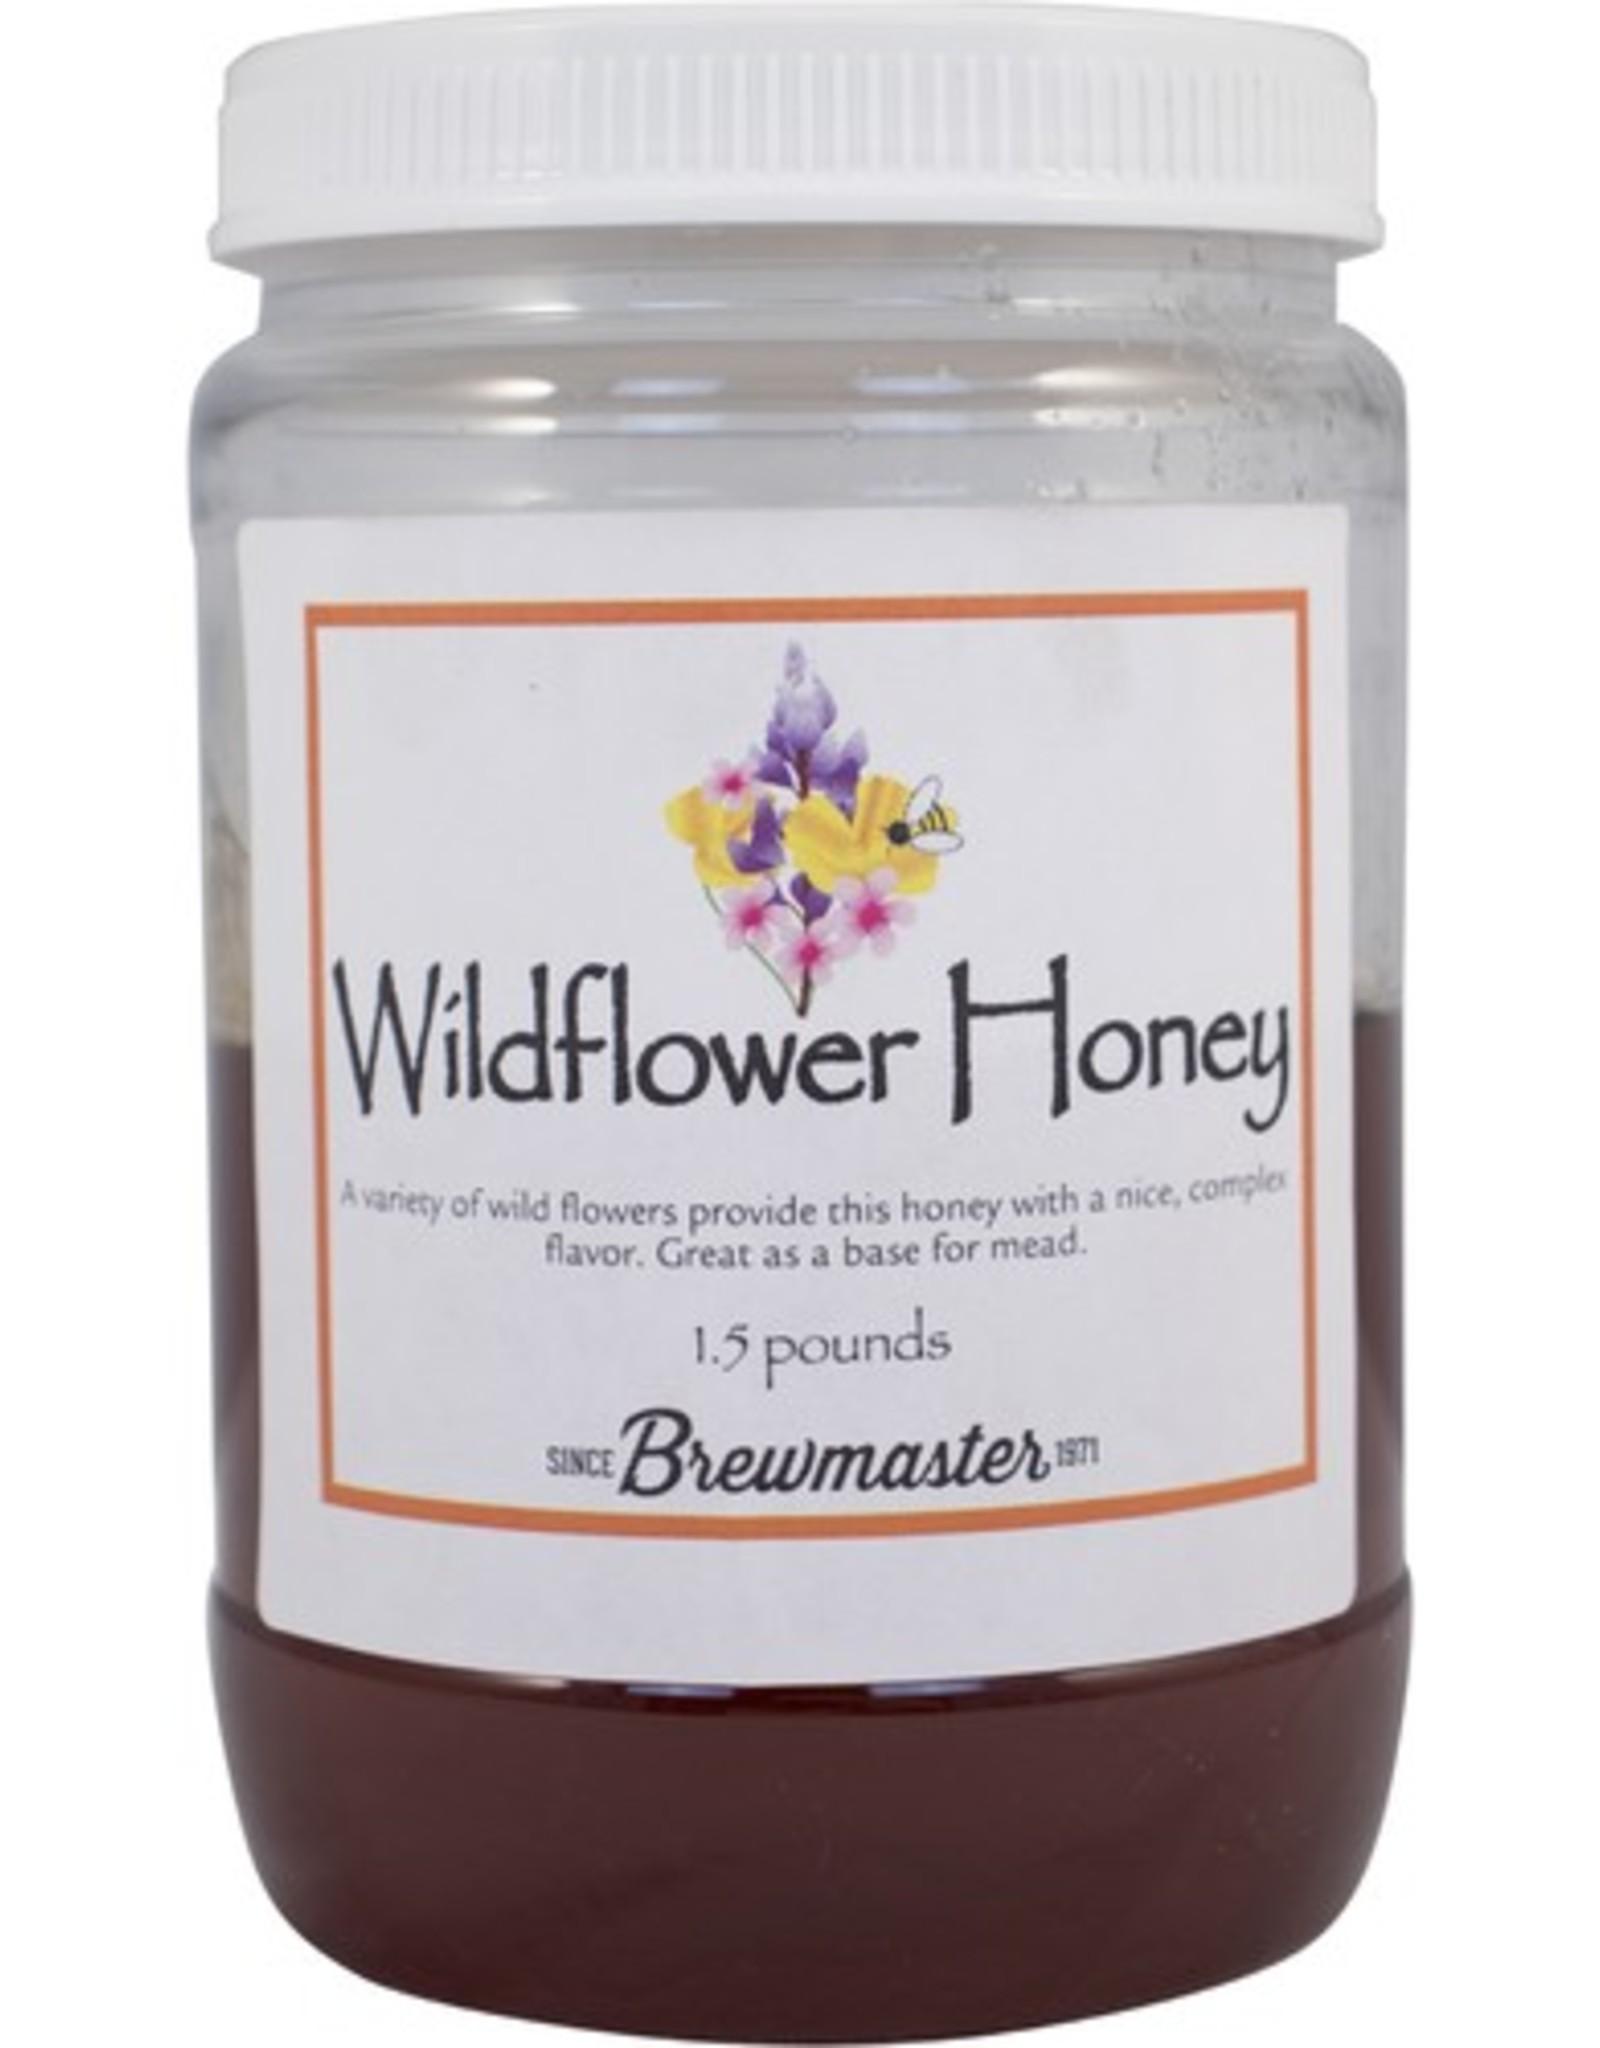 WILDFLOWER HONEY 6lb